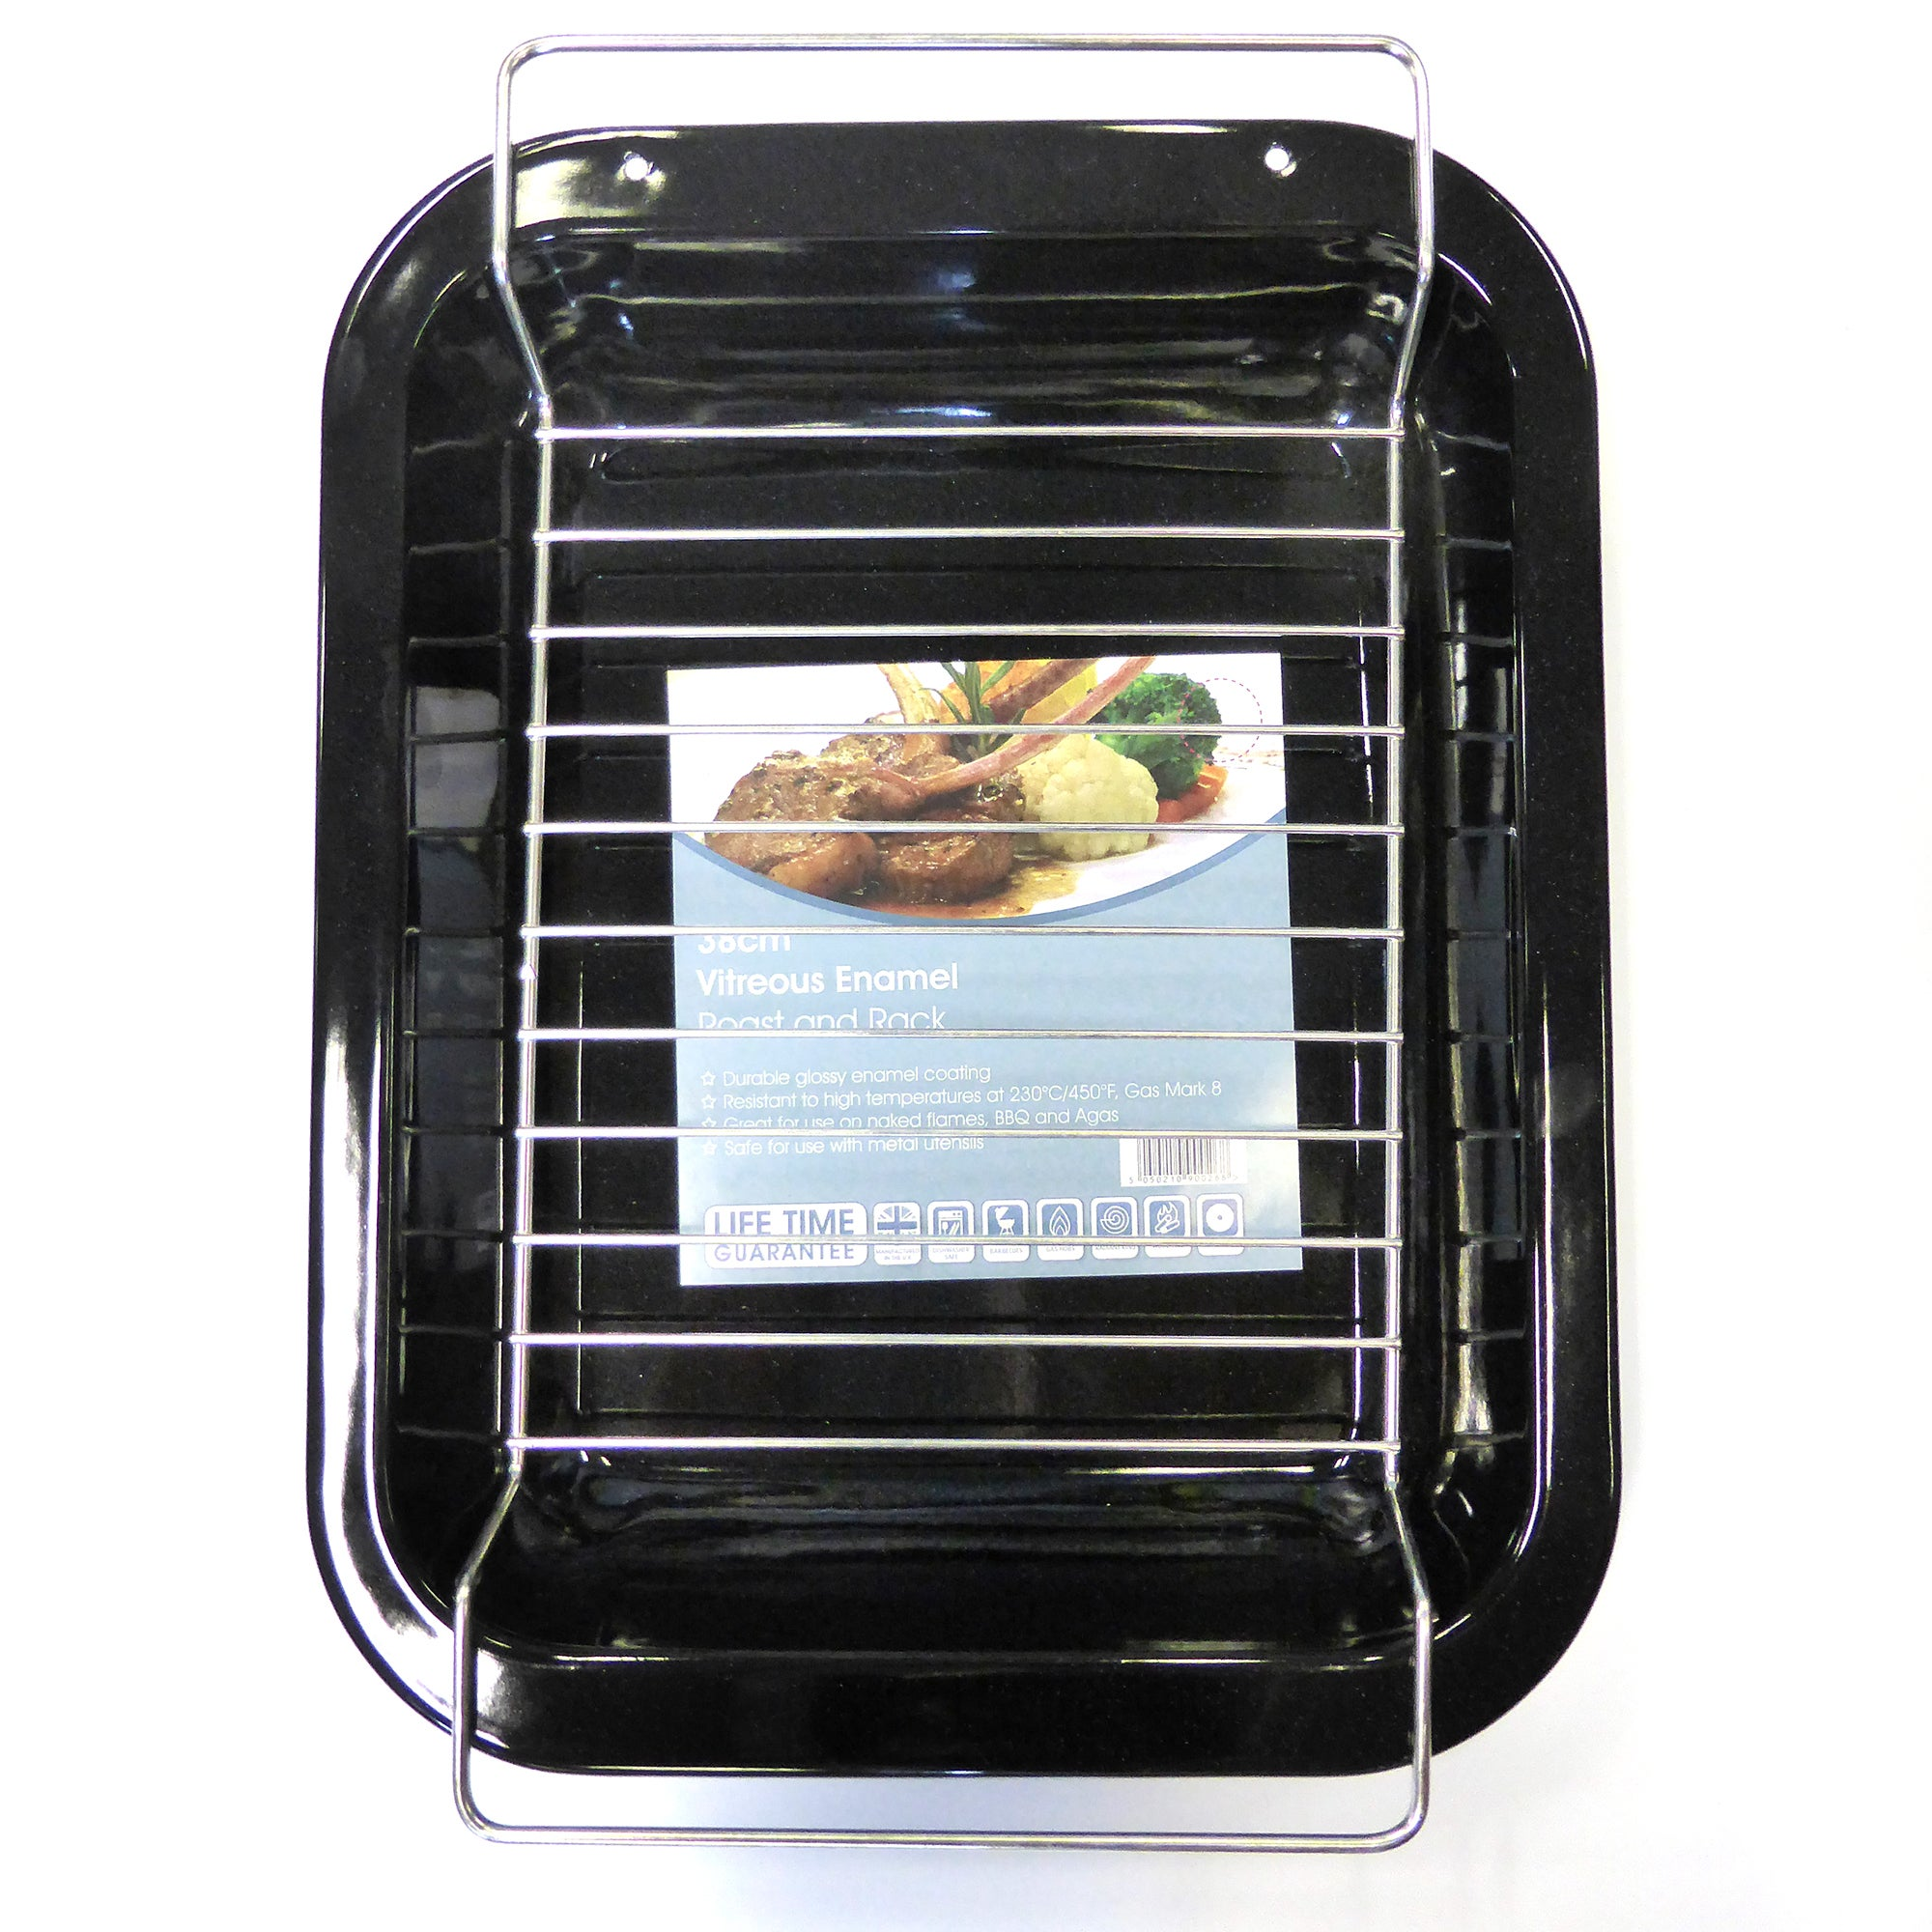 Vitreous Enamel Roast Rack